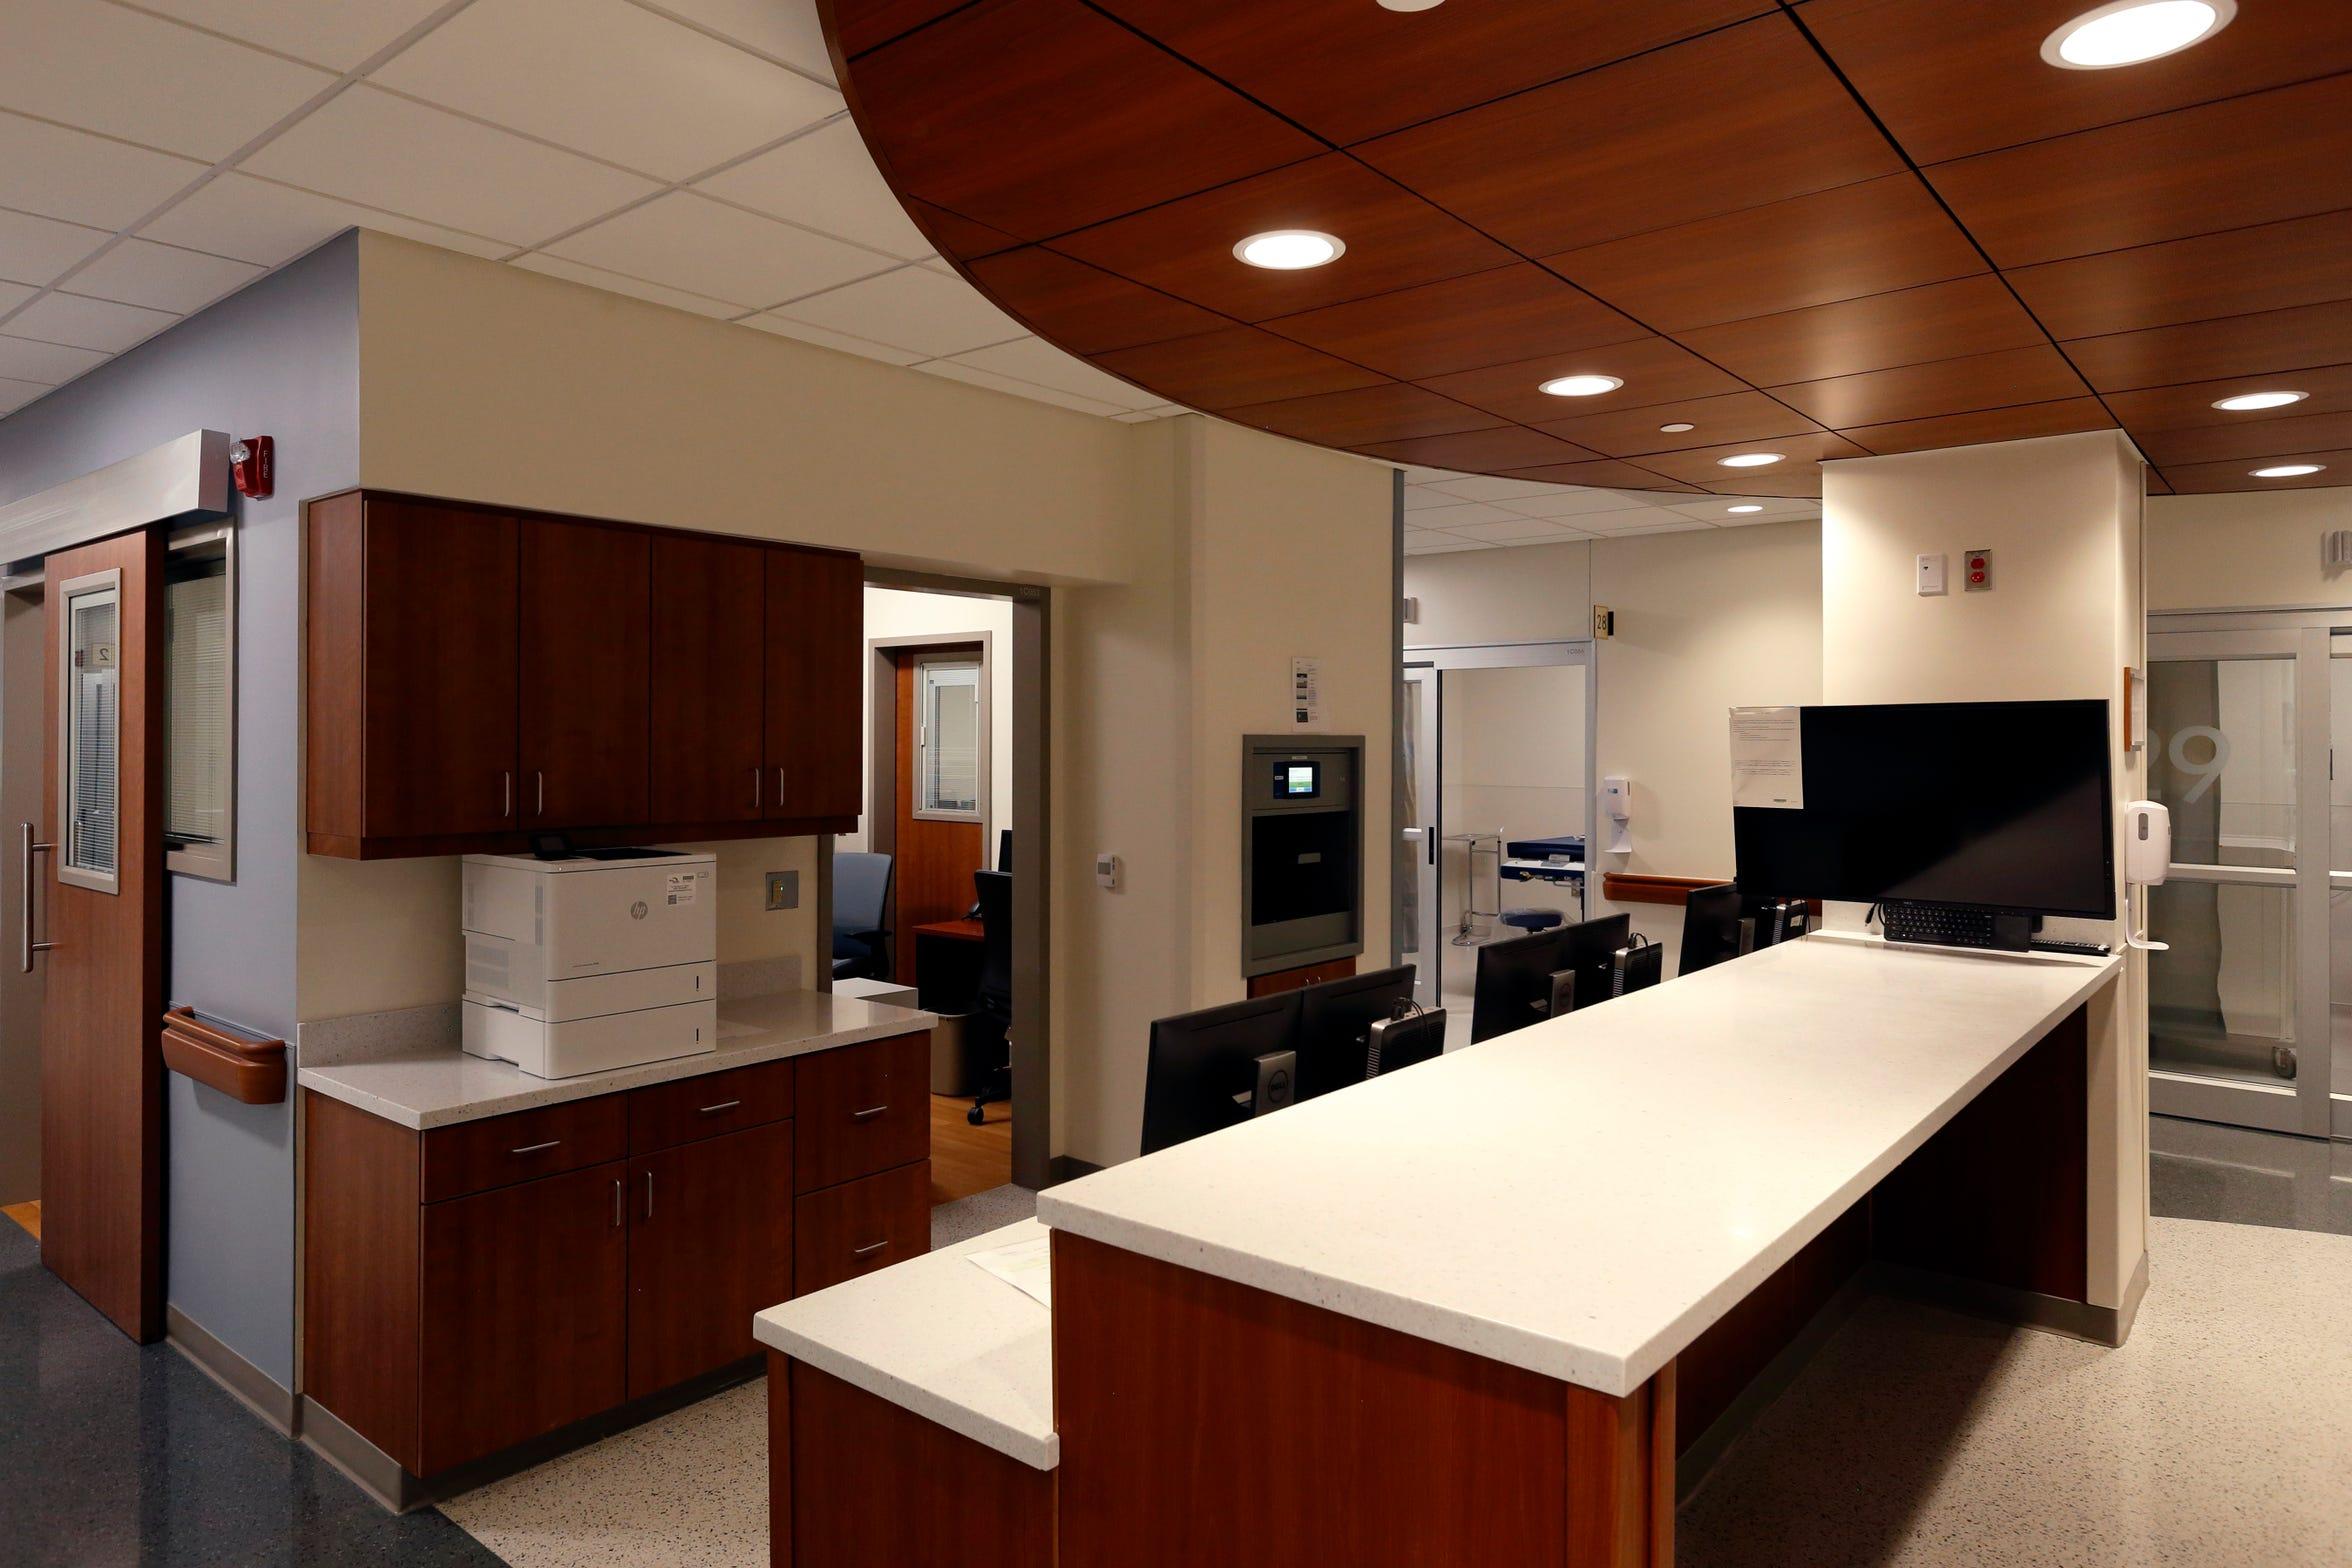 Nurses' station at Augusta Health's Emergency Department in Fishersville, Virginia.